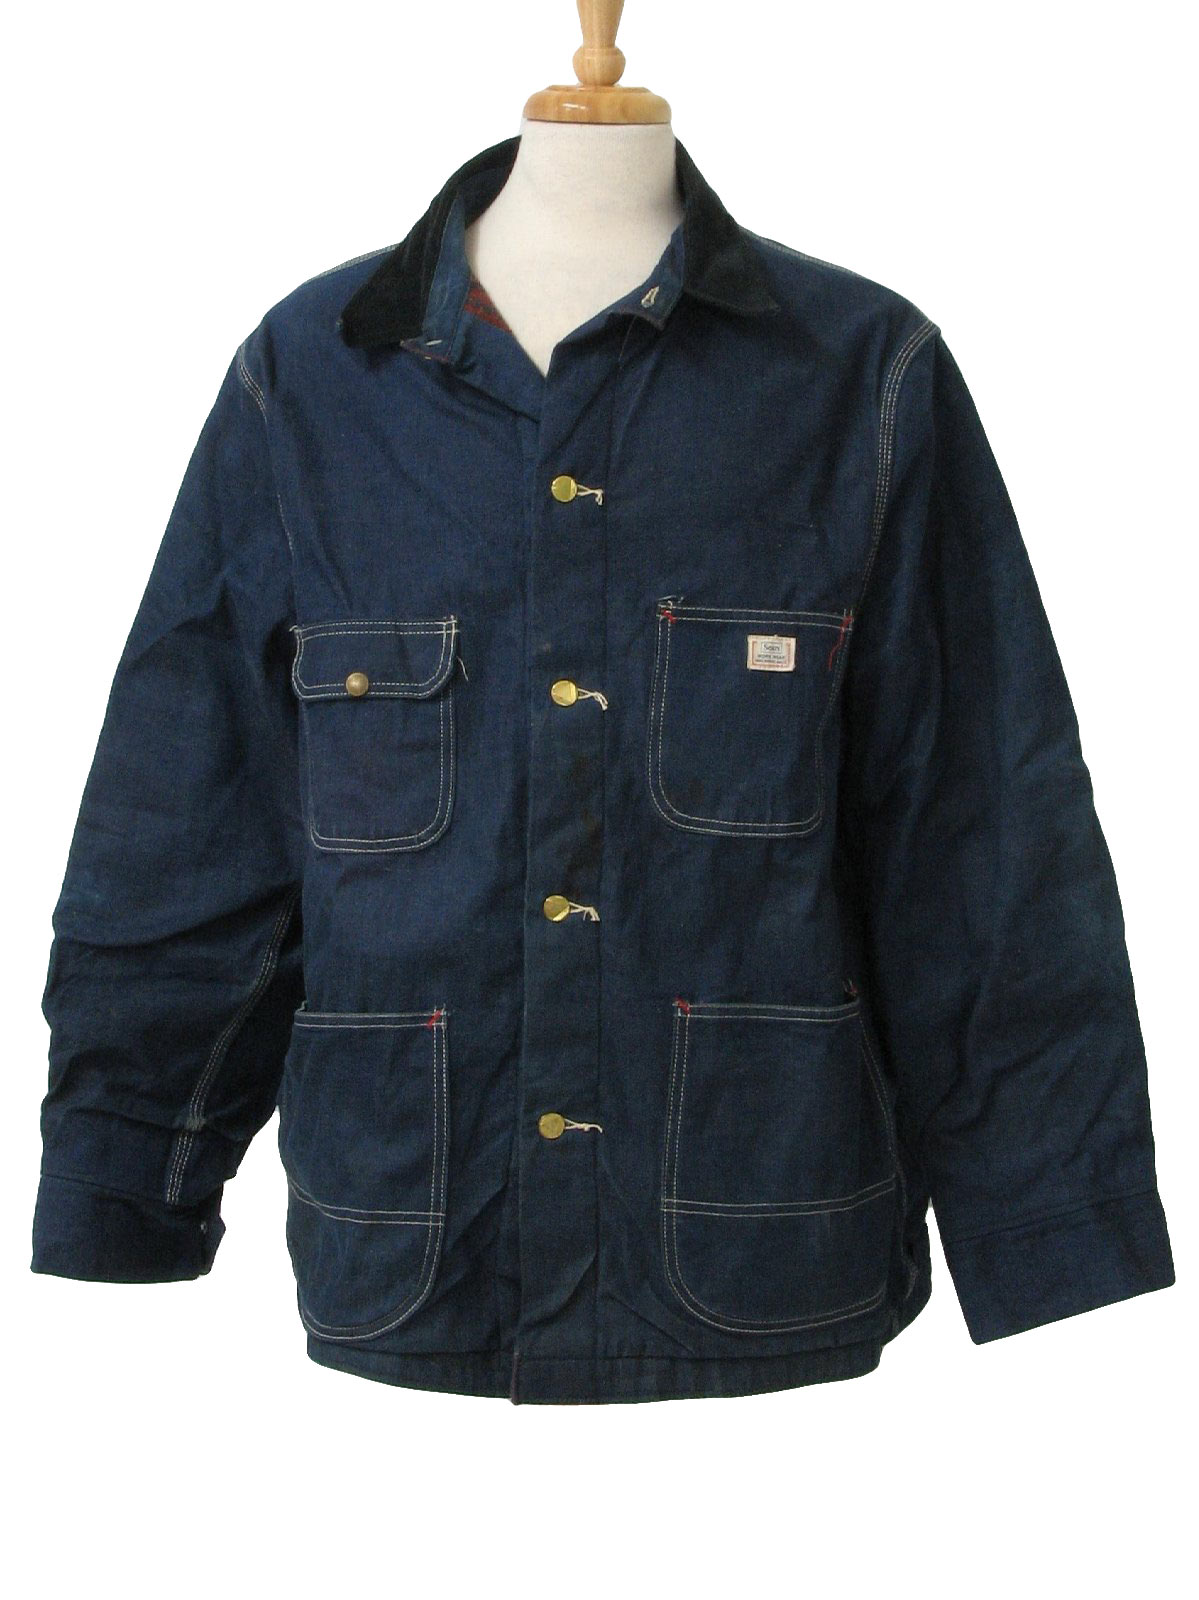 Retro 60's Jacket: Early 60s -Sears Workwear- Mens well ... | 1199 x 1600 jpeg 203kB